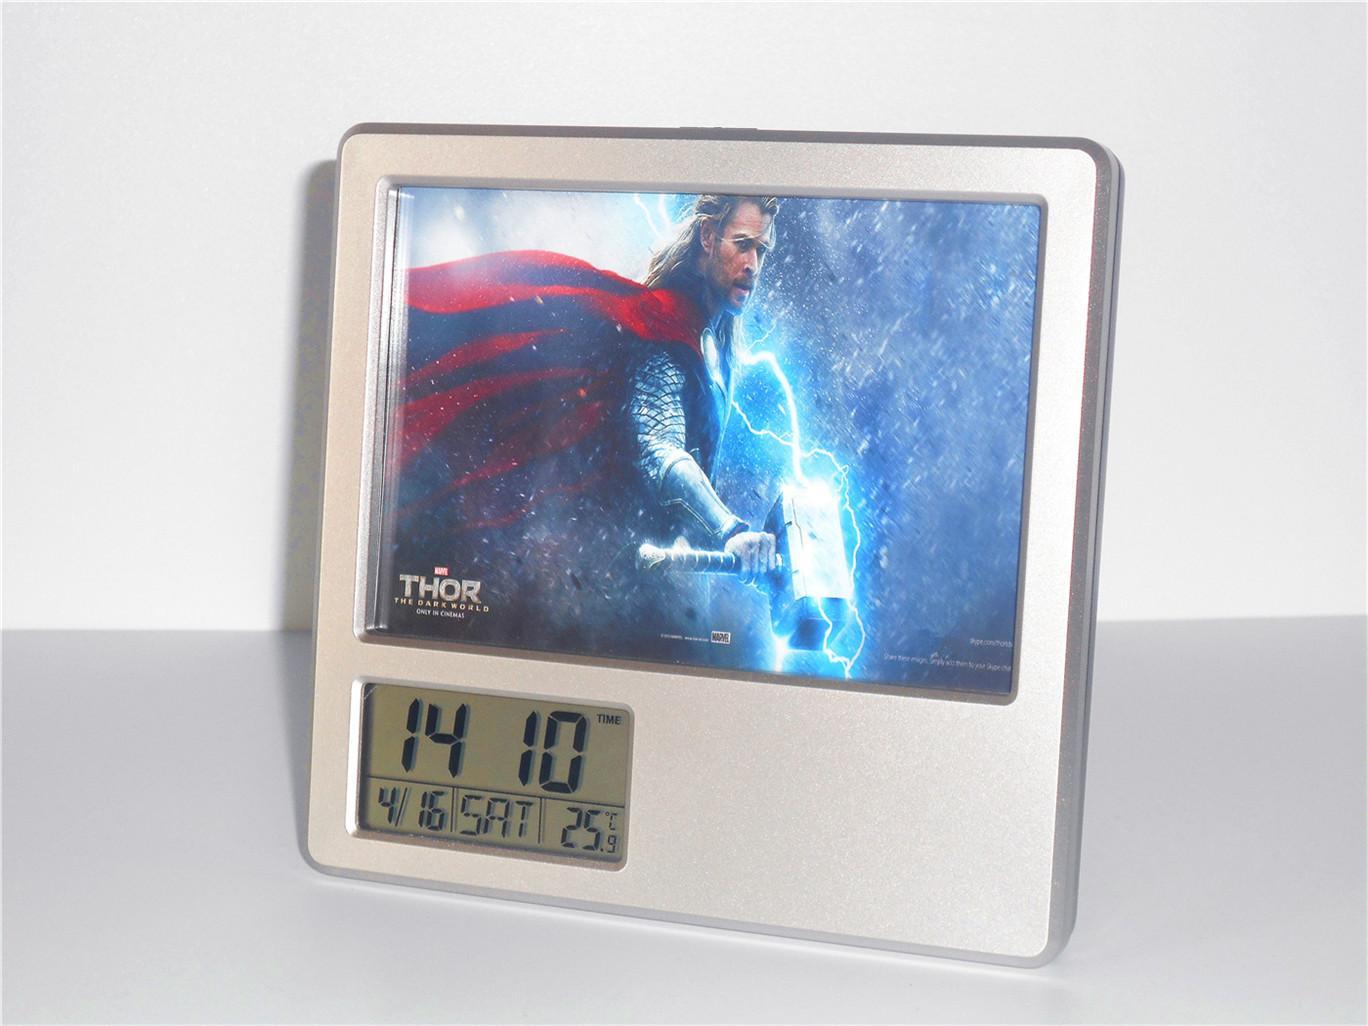 Creative Digital Calendar creative digital calendar avengers thor alarm clock multifunction